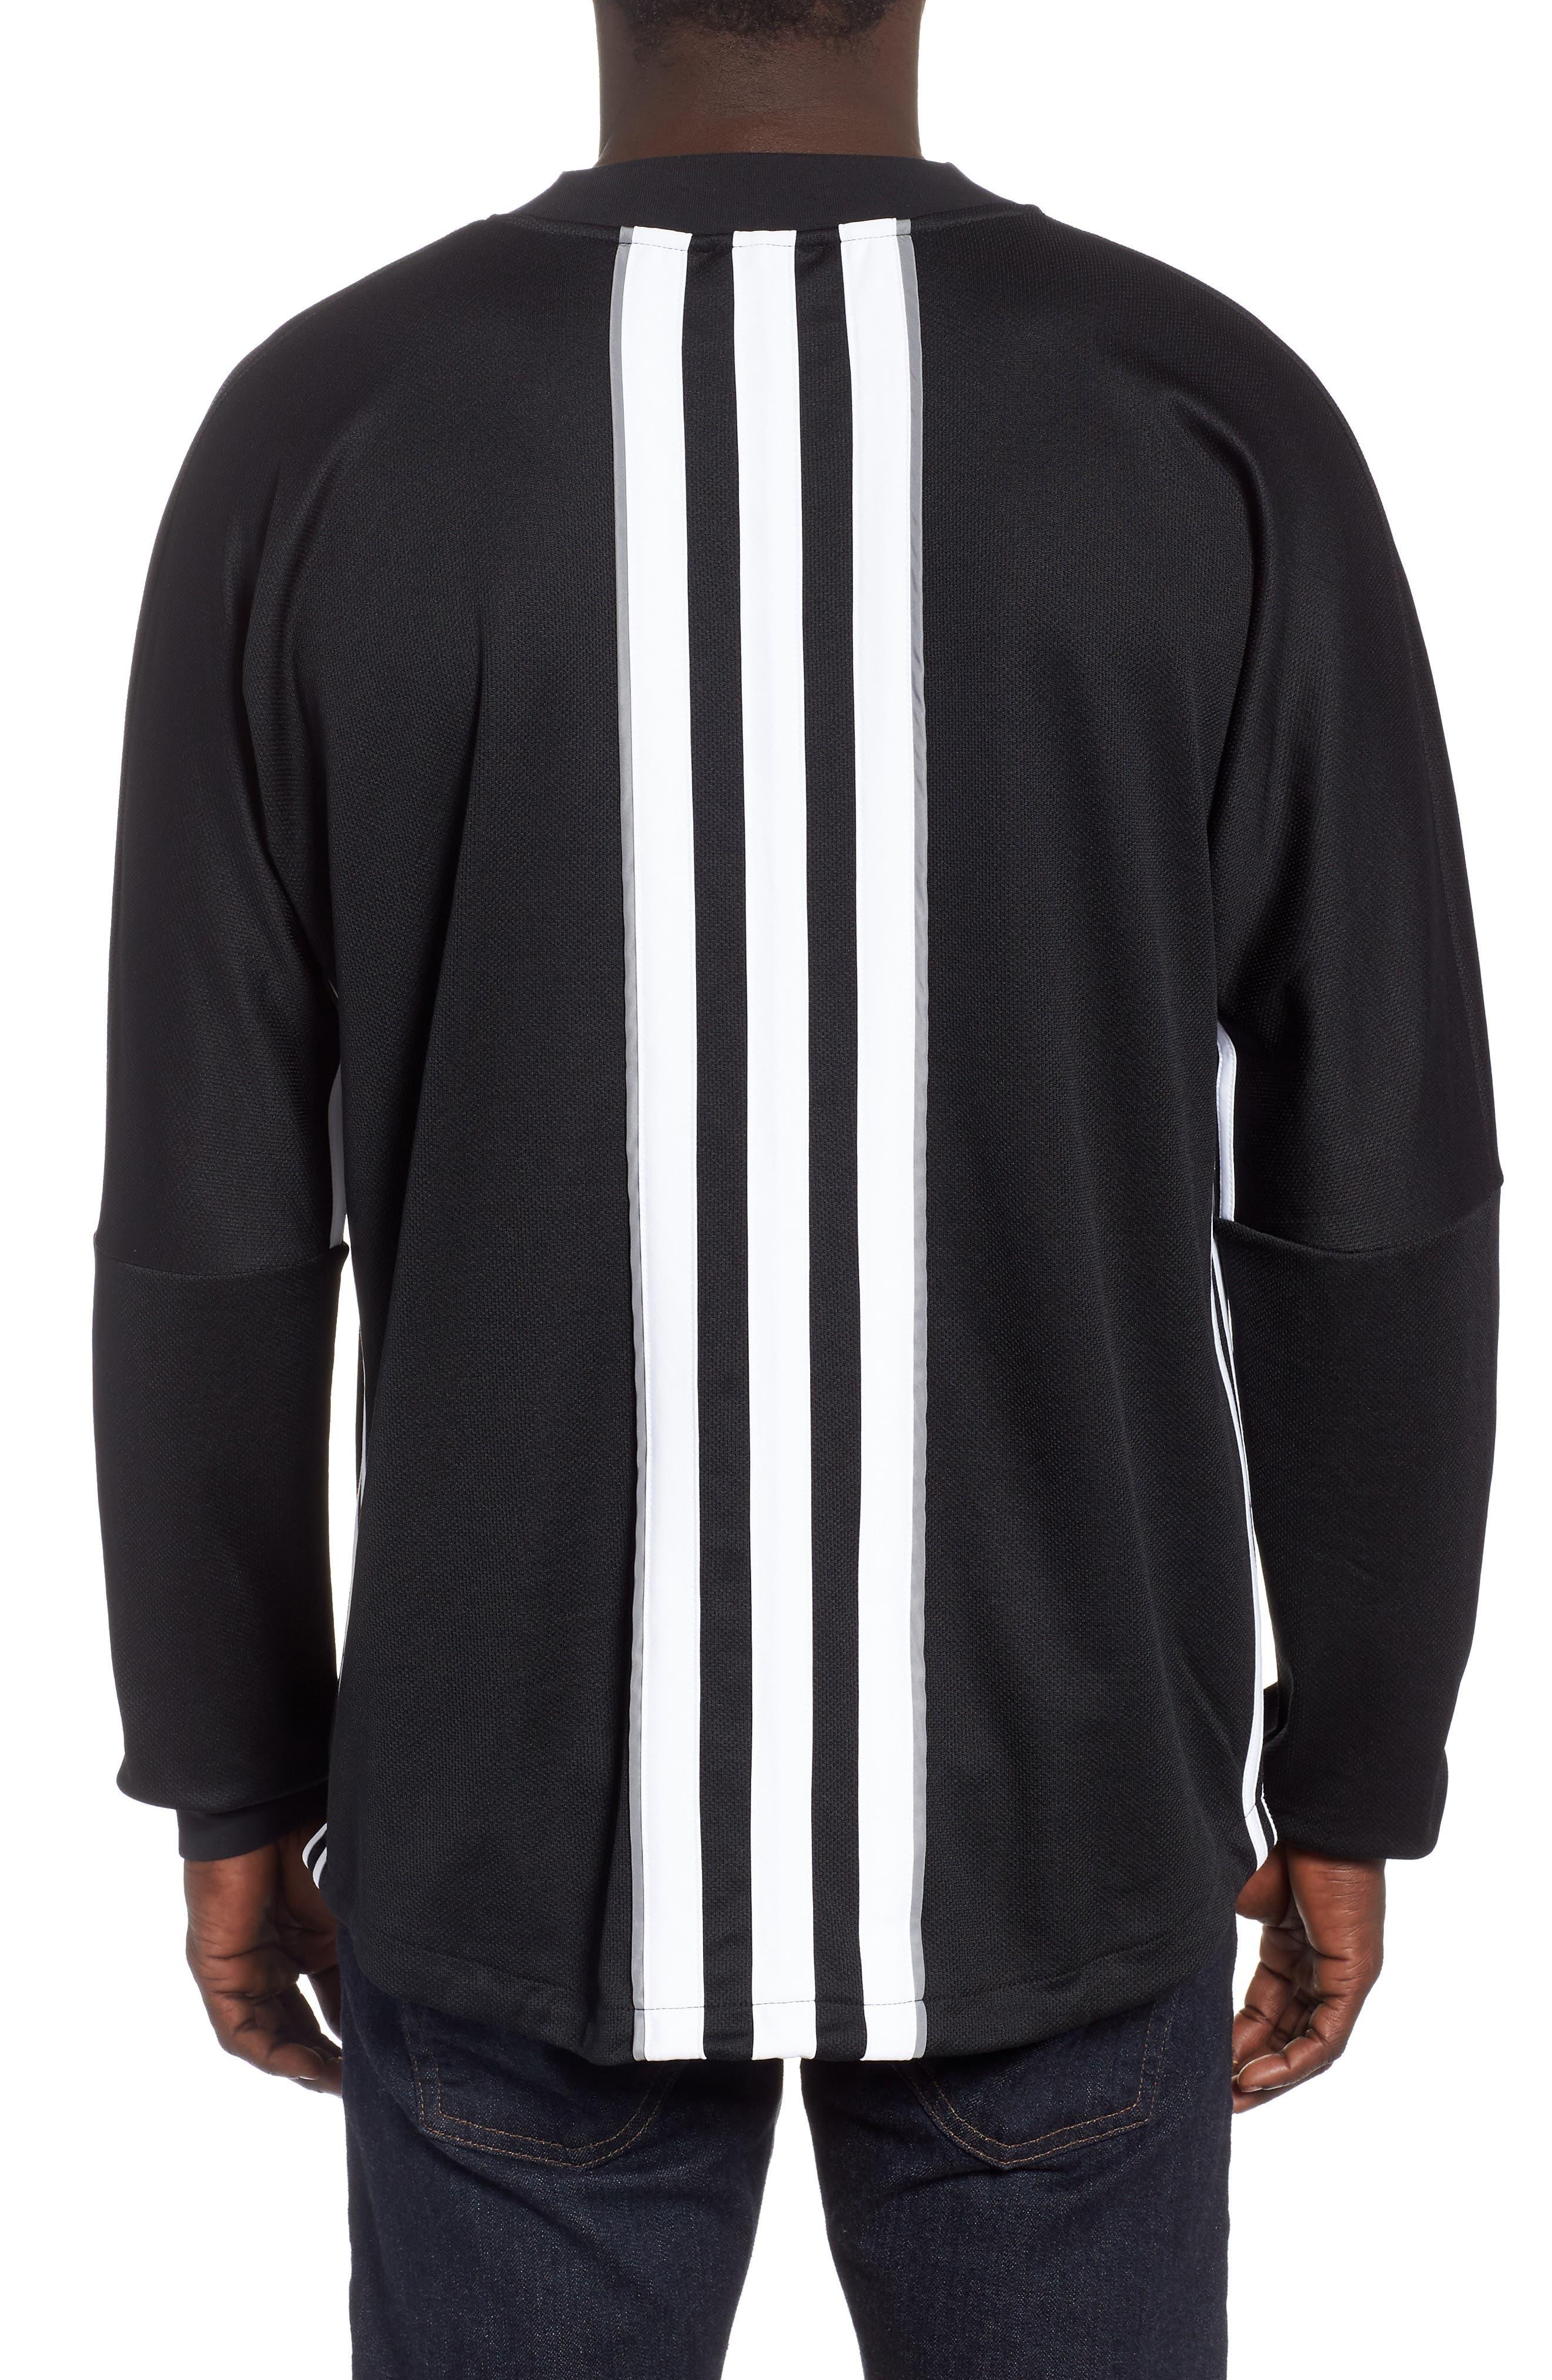 Authentics Long Sleeve Goalie Shirt,                             Alternate thumbnail 2, color,                             BLACK/ WHITE